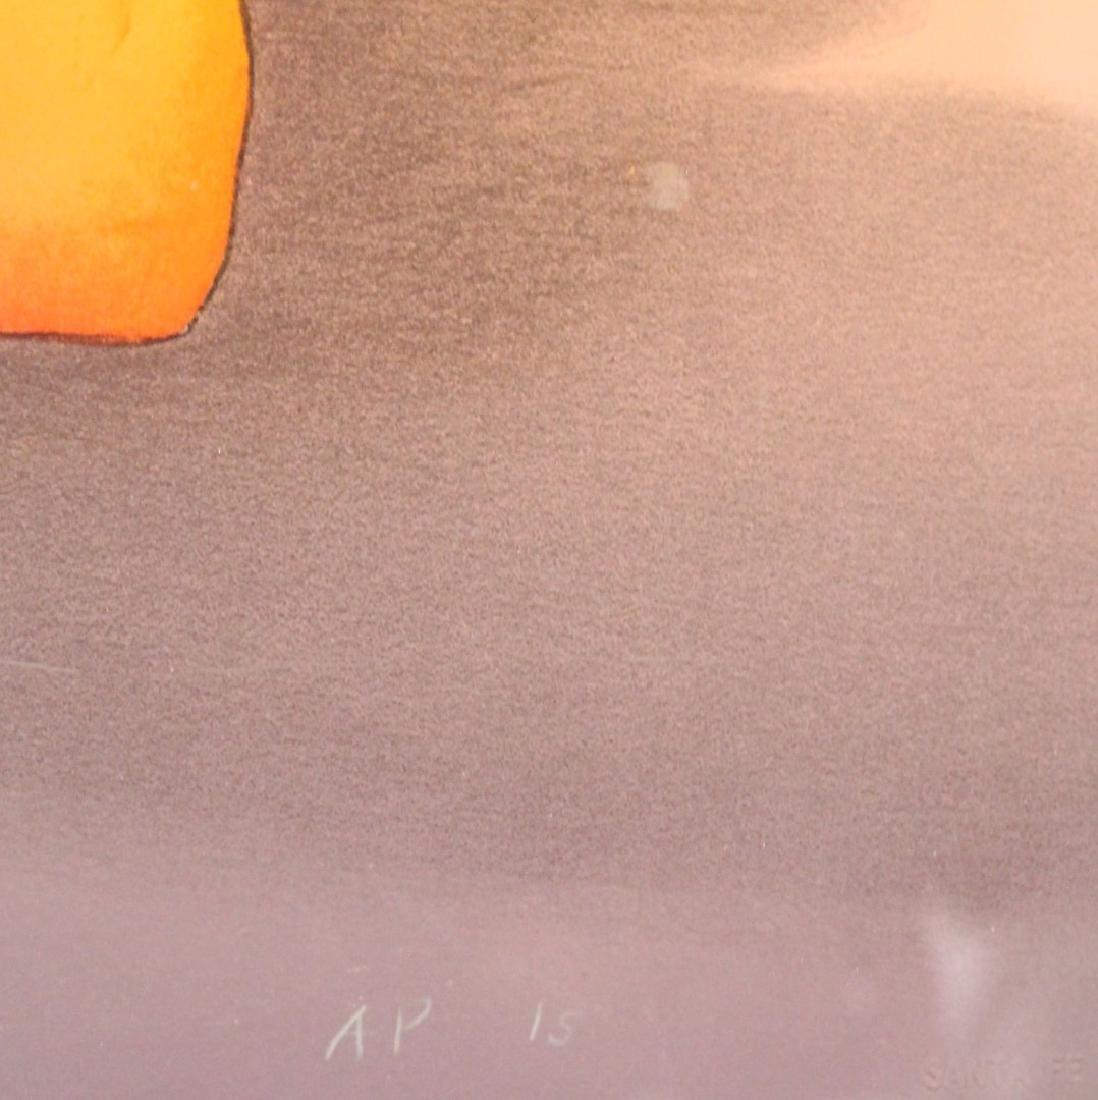 R.C. Gorman; Framed Lithograph - Deseo - 5